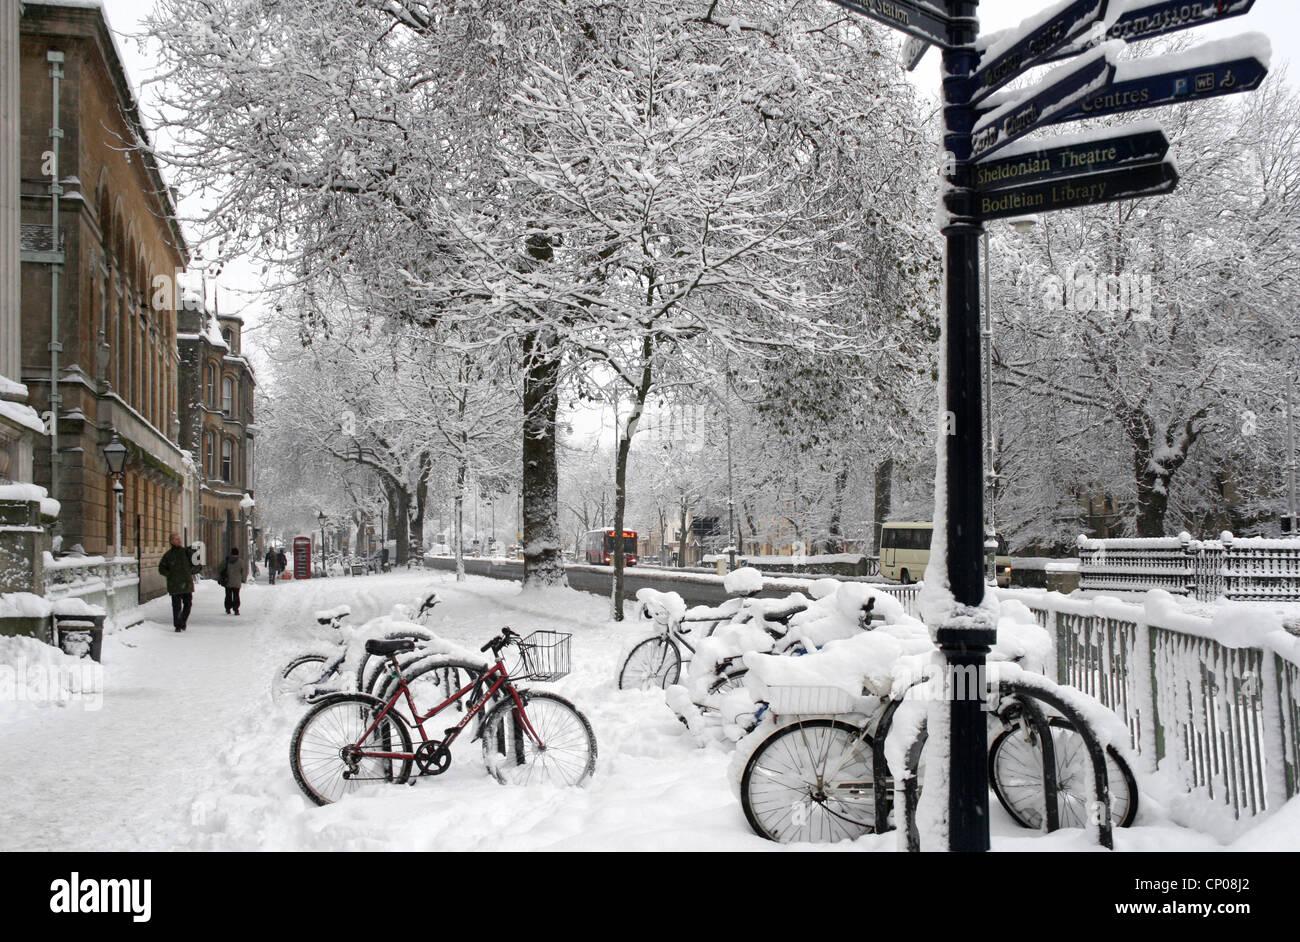 Snow scene Oxford City Centre - Stock Image